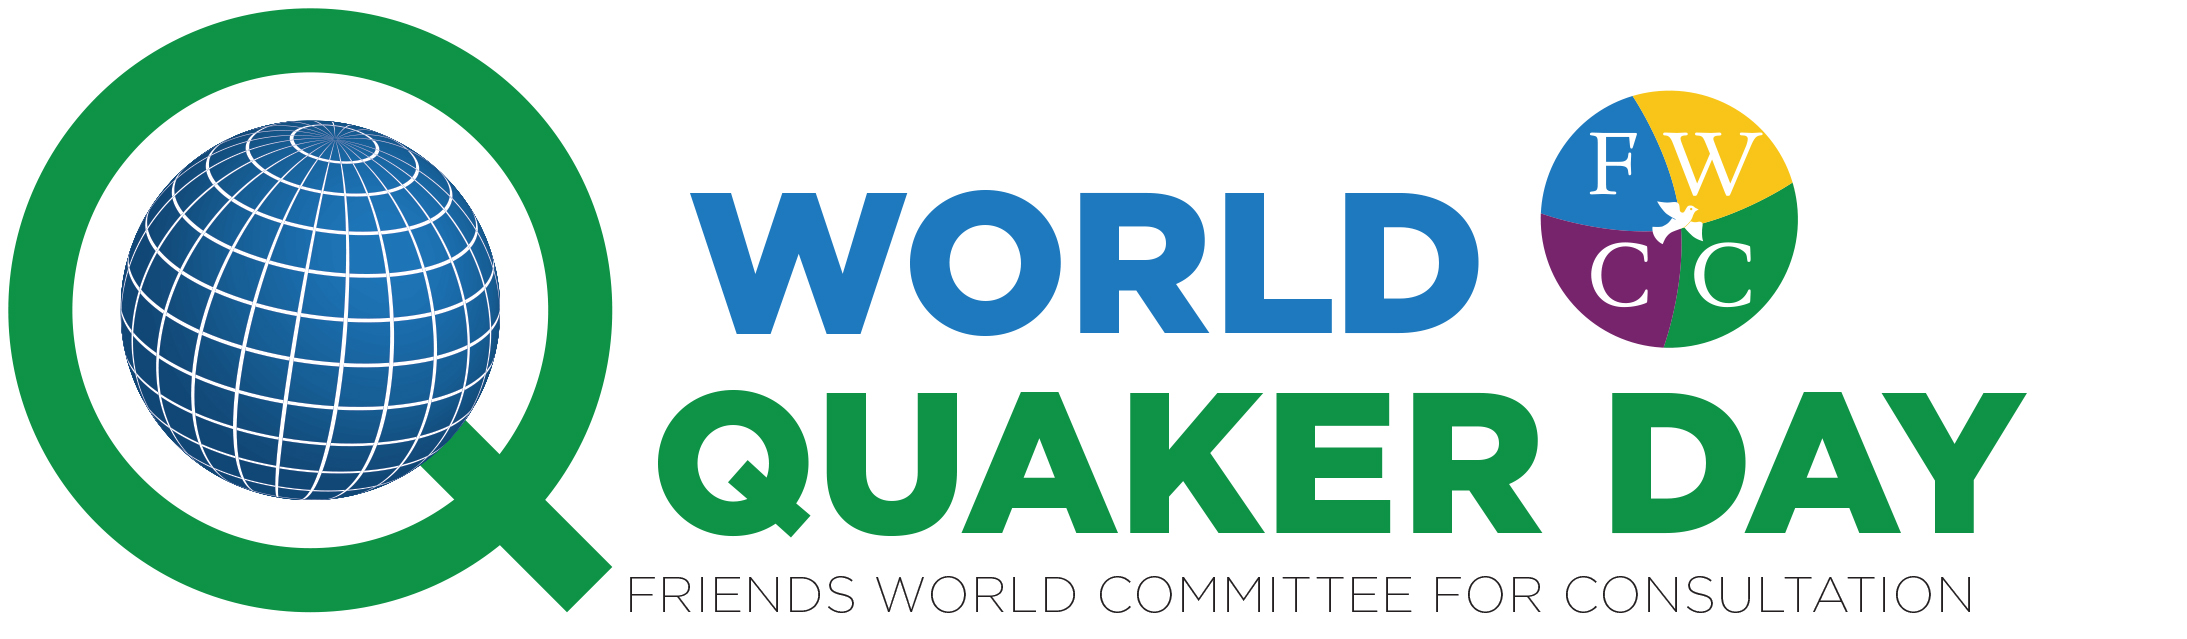 World Quaker Day - FWCC